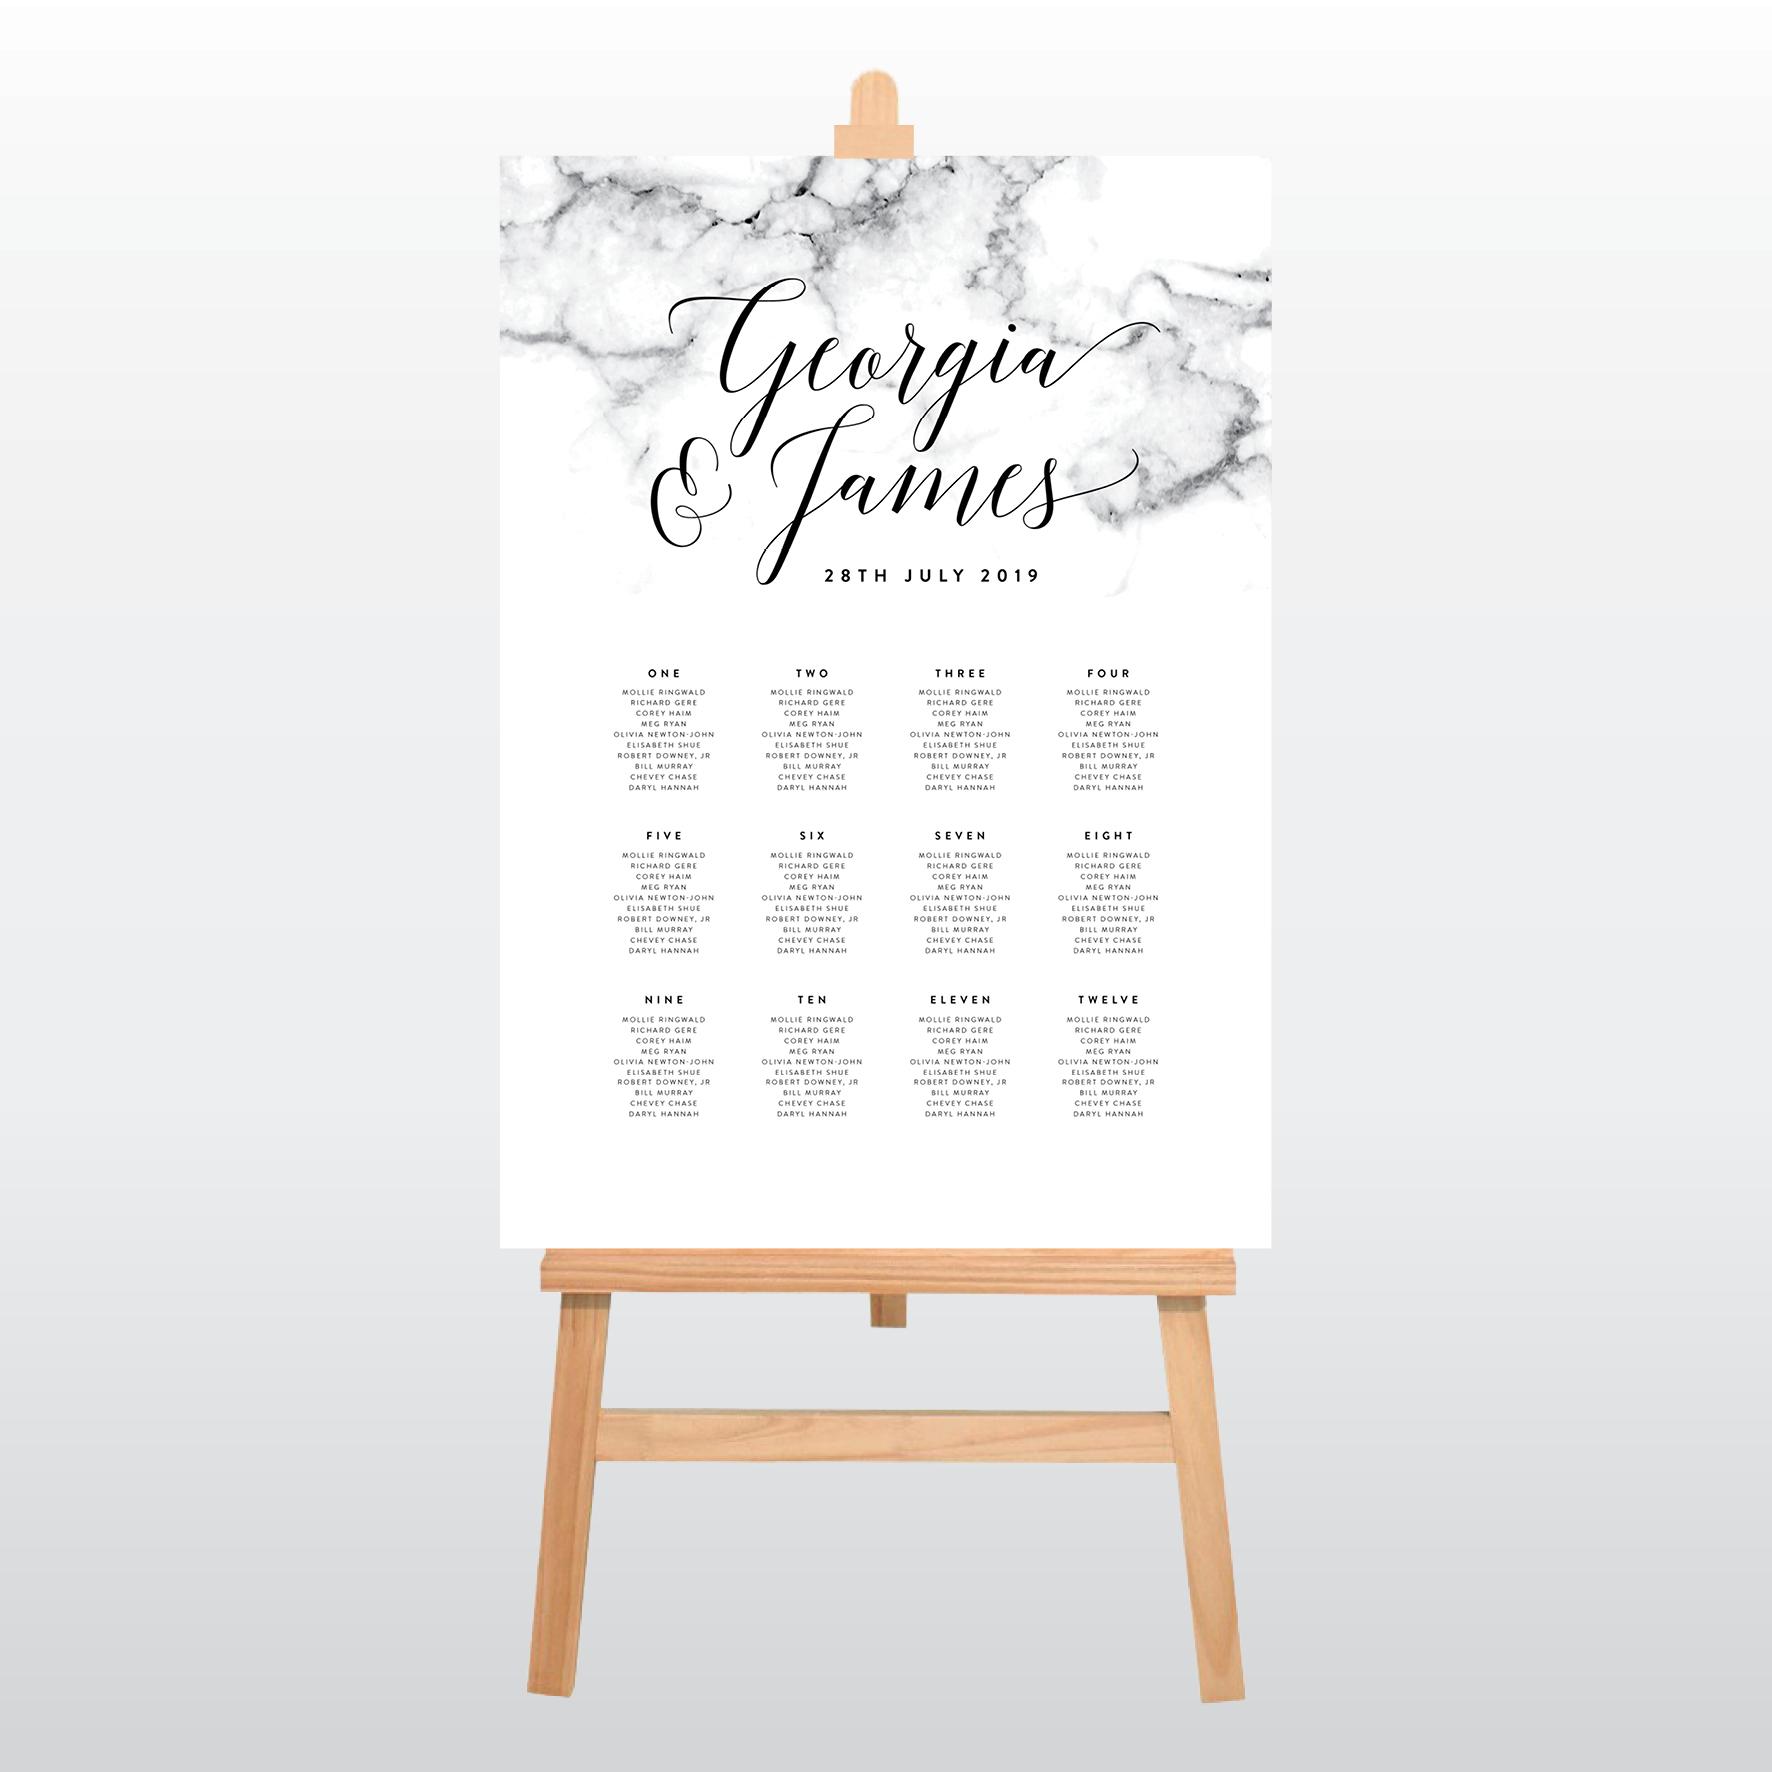 Carrara Table Plan V1.jpg